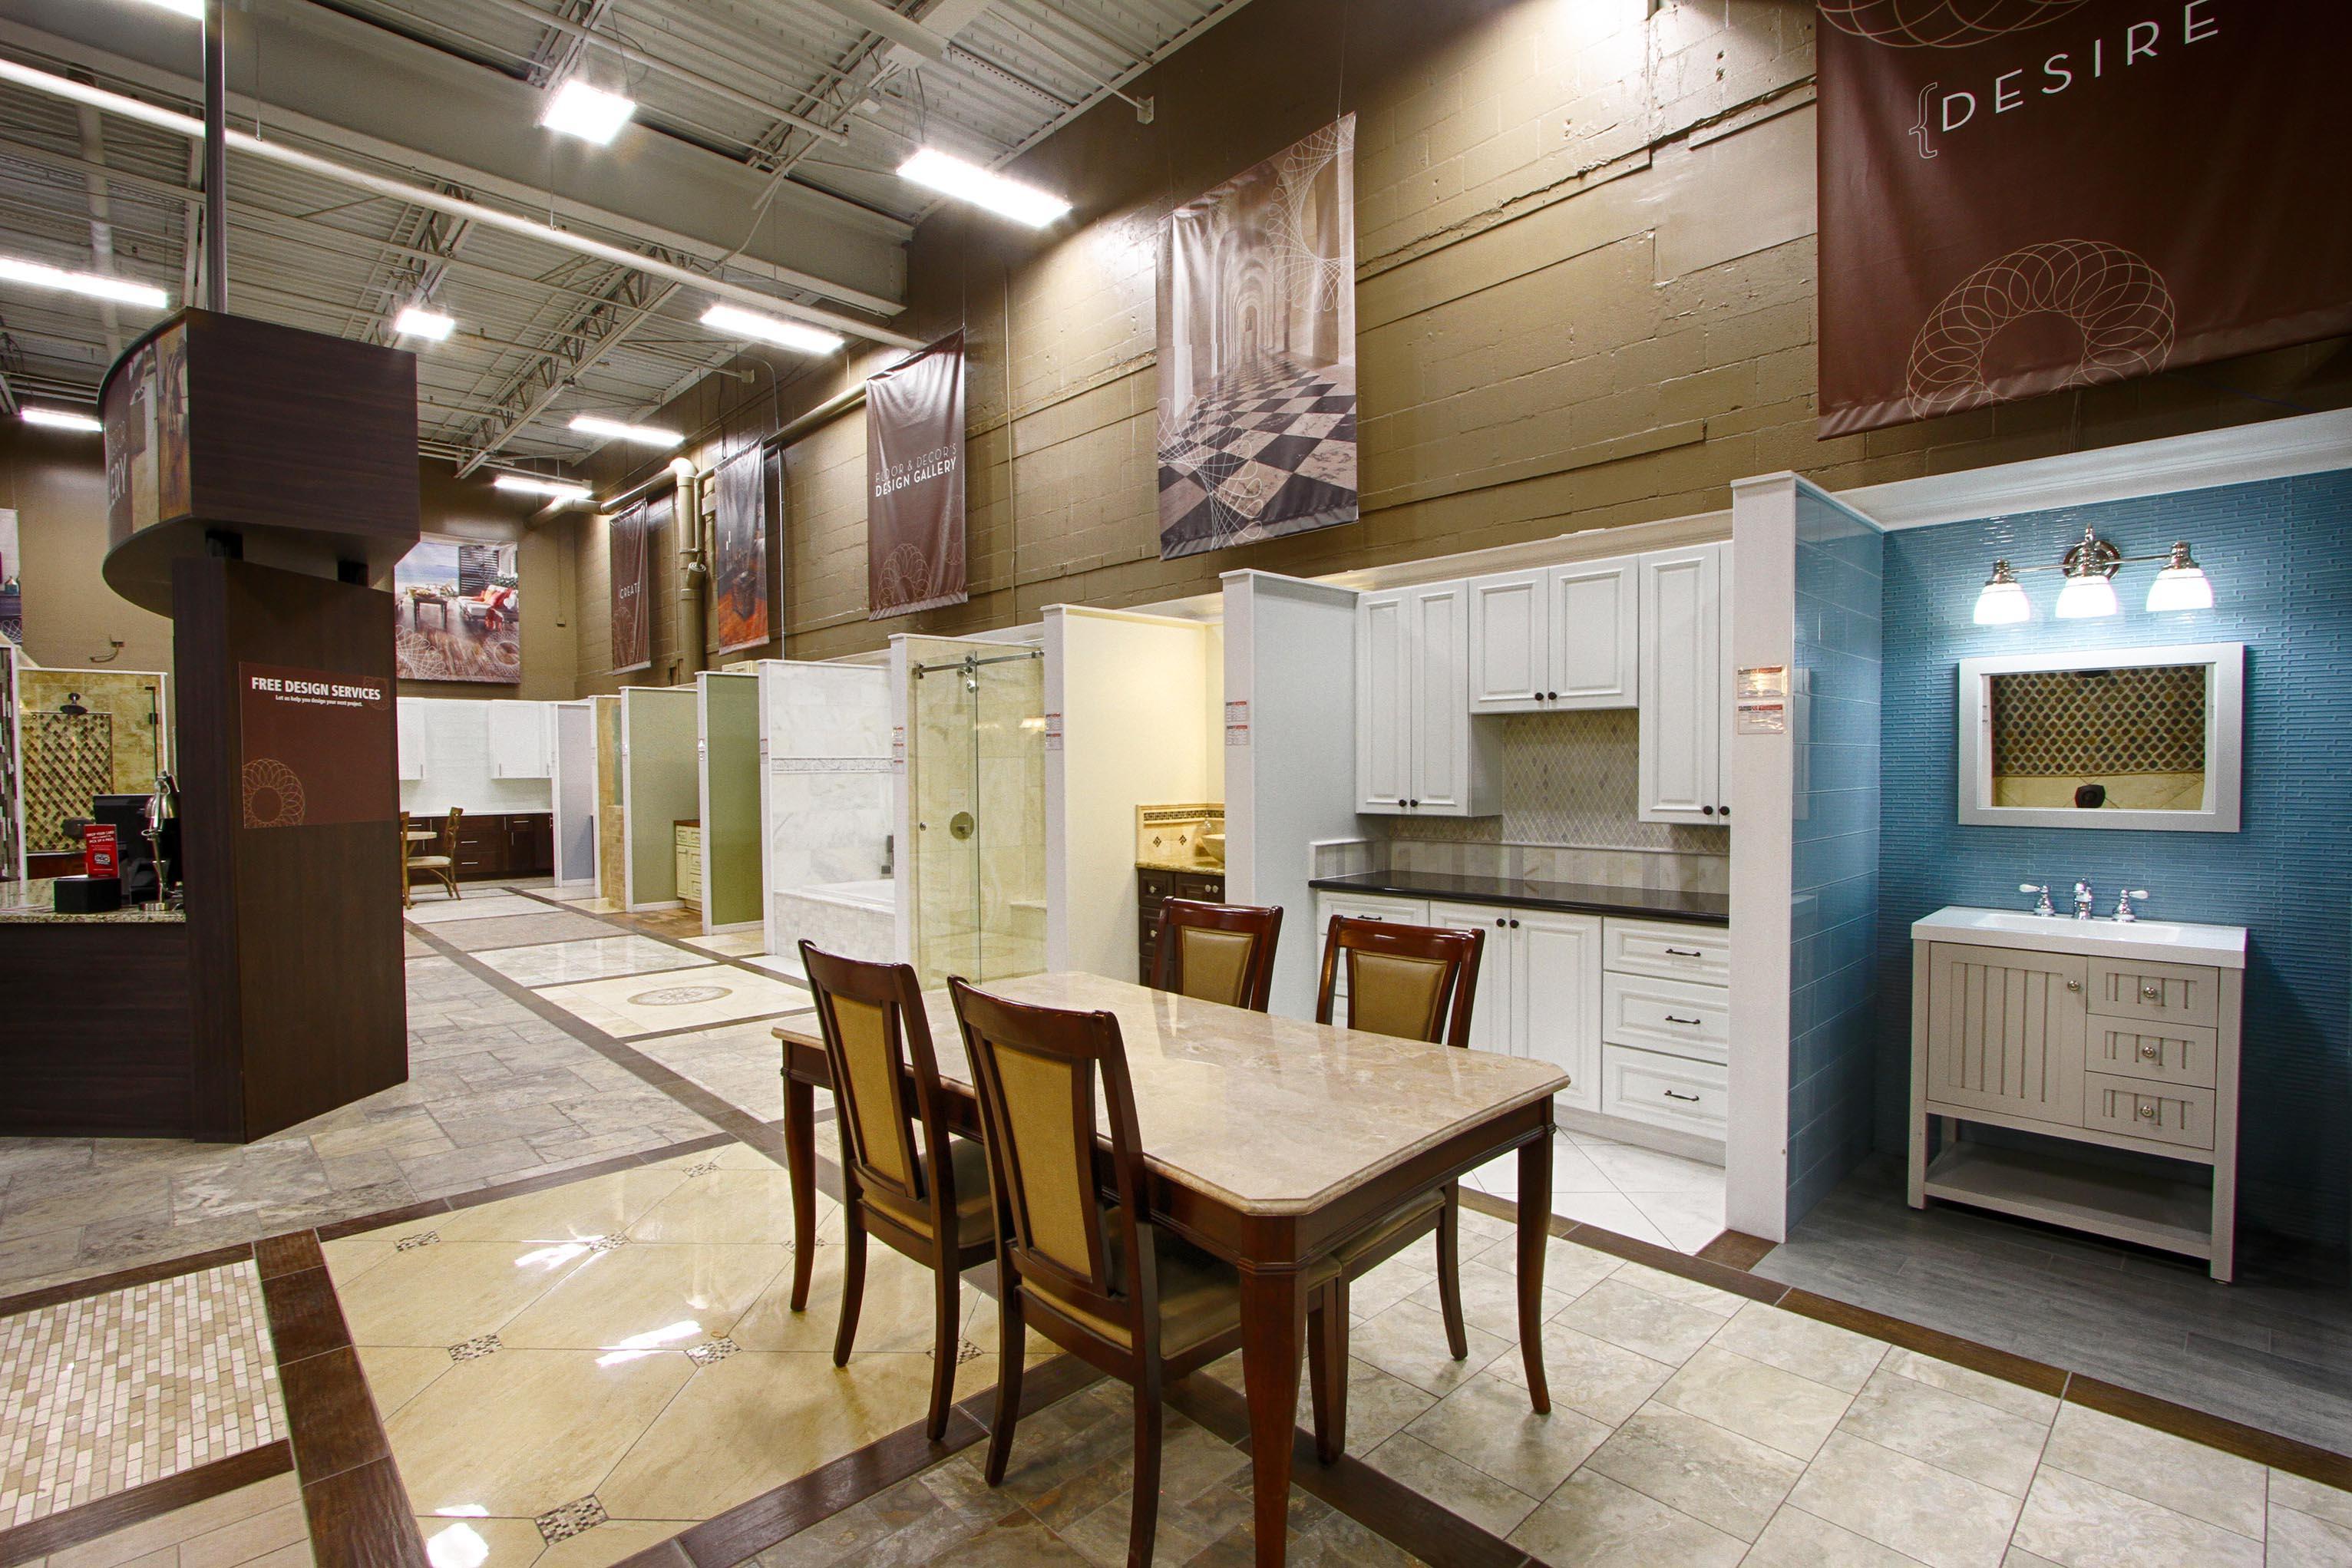 Floor & Decor 9 US Highway 9 N Clearwater, FL Flooring - MapQuest